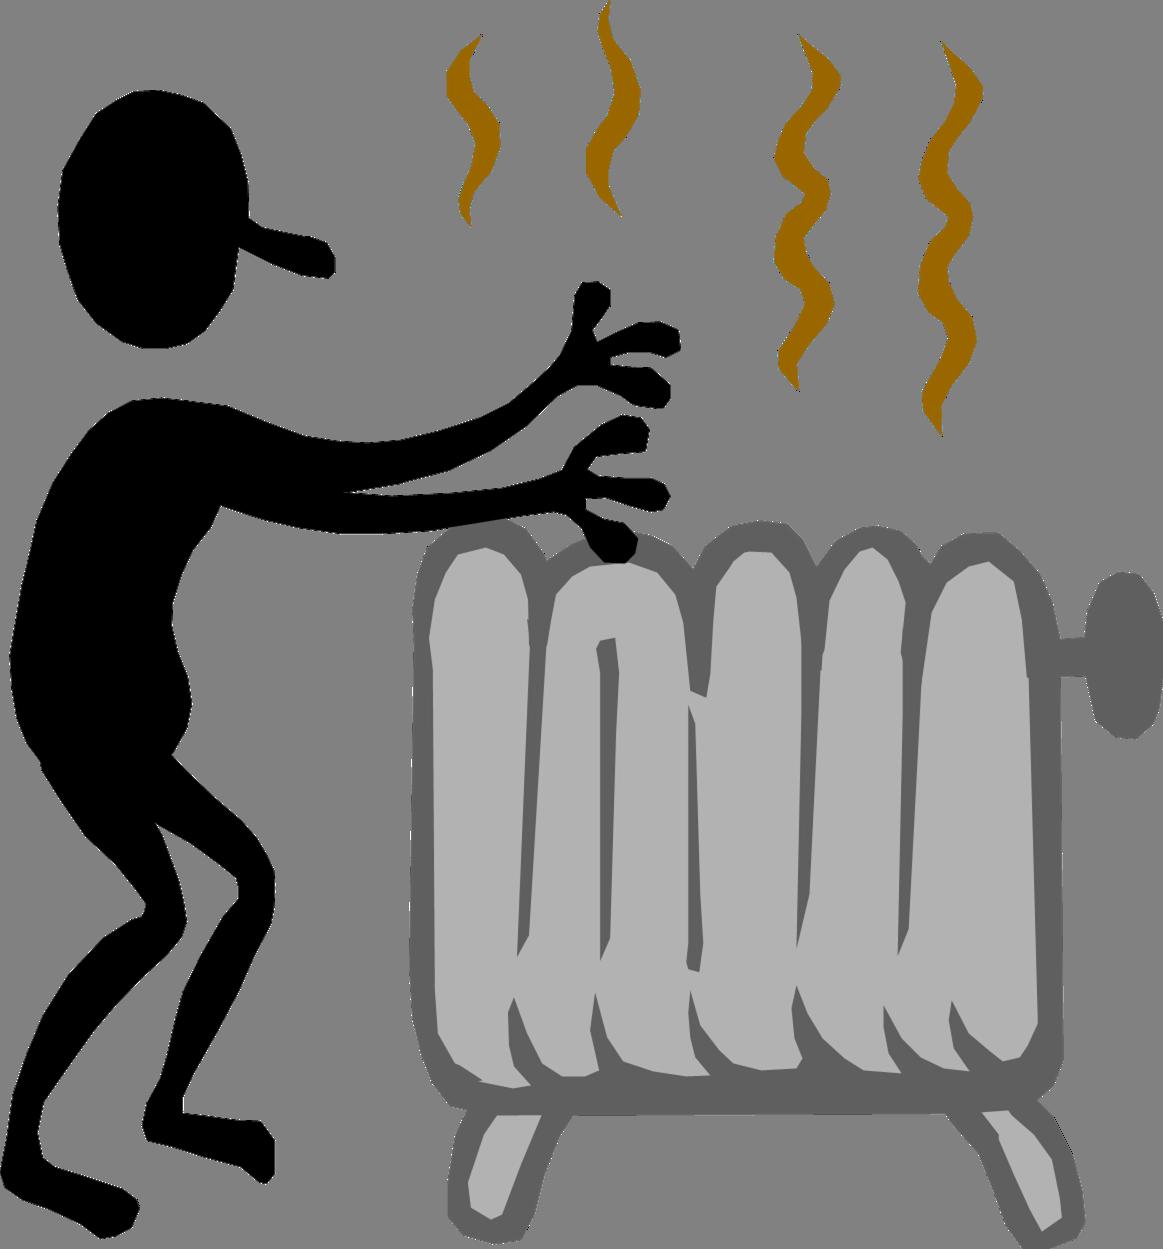 Heat clipart burn injury Prevention & www Burn Foundation